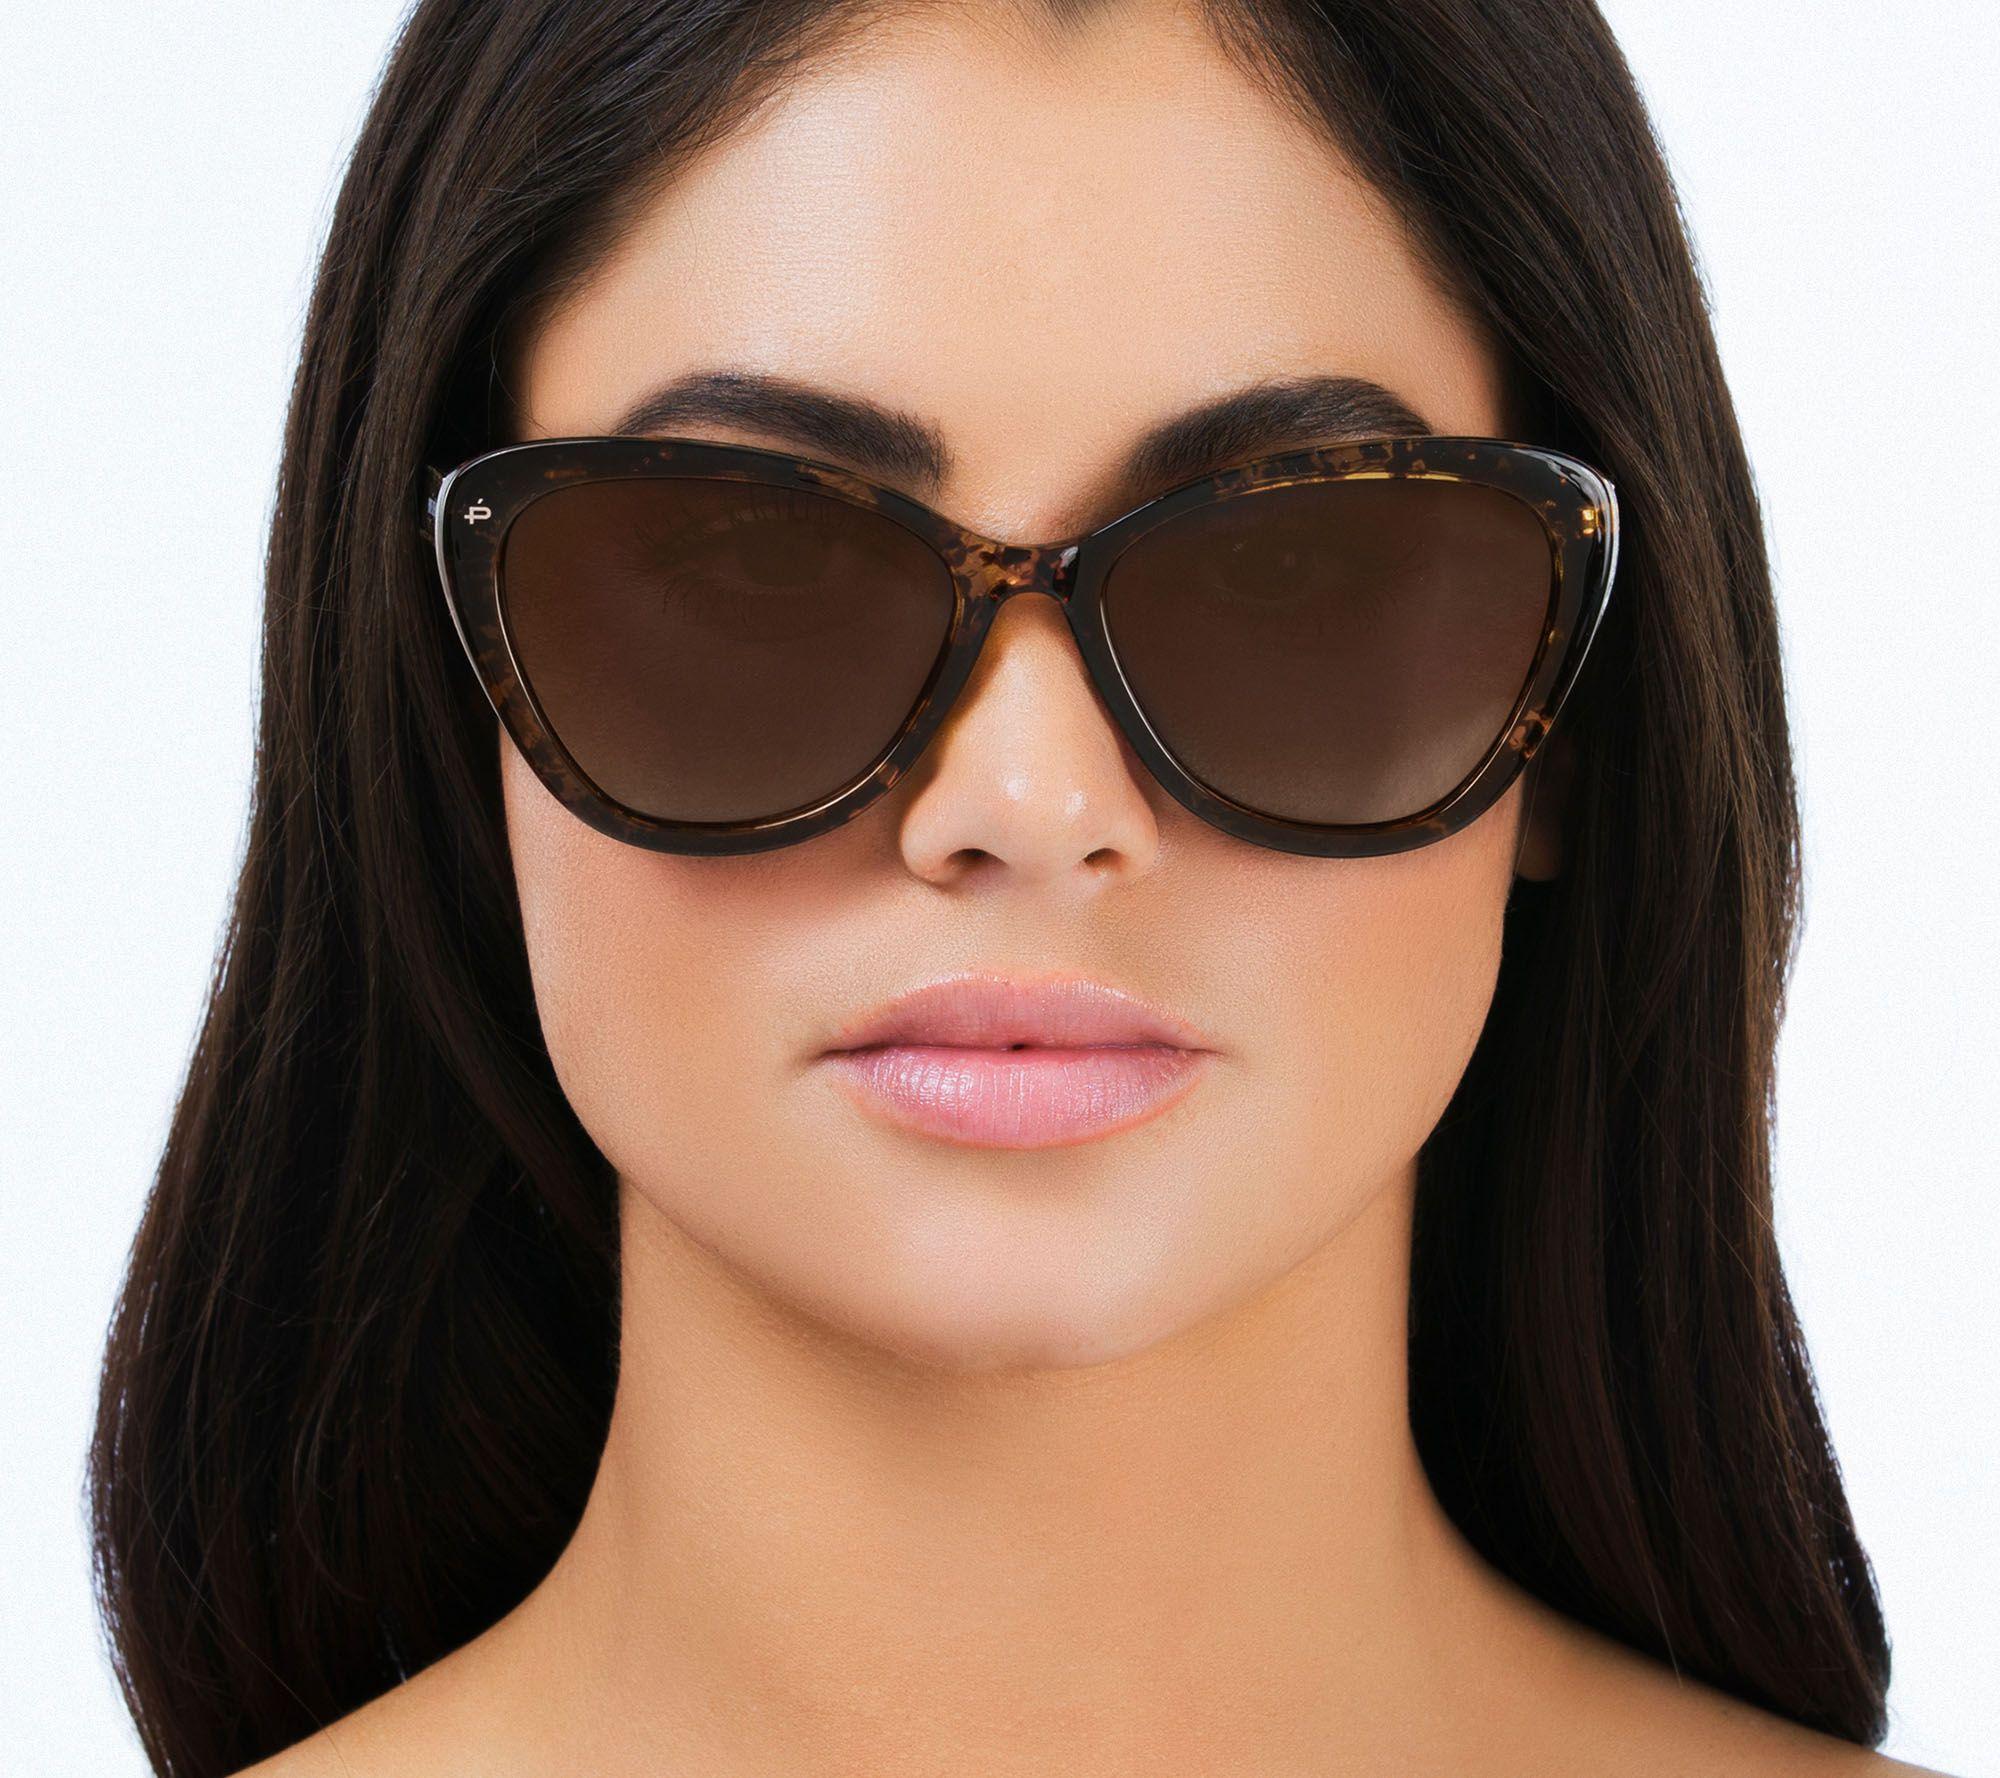 8ba6cde20a Prive Revaux The Hepburn 2.0 Cat-Eye Polarized Sunglasses - Page 1 — QVC.com